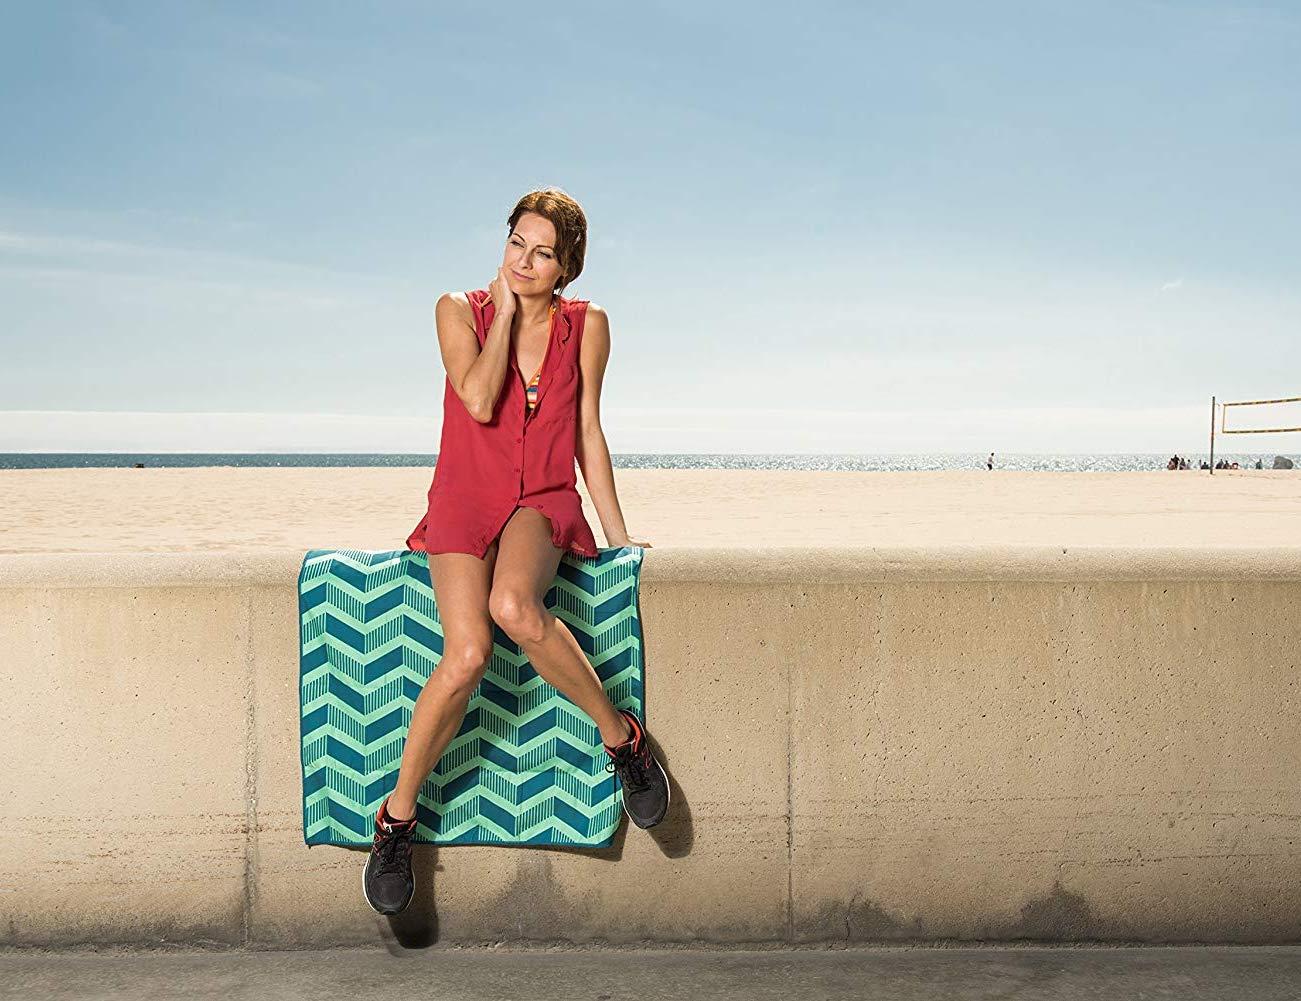 Acteon Compact Antibacterial Microfiber Towel is a beachgoer's best friend